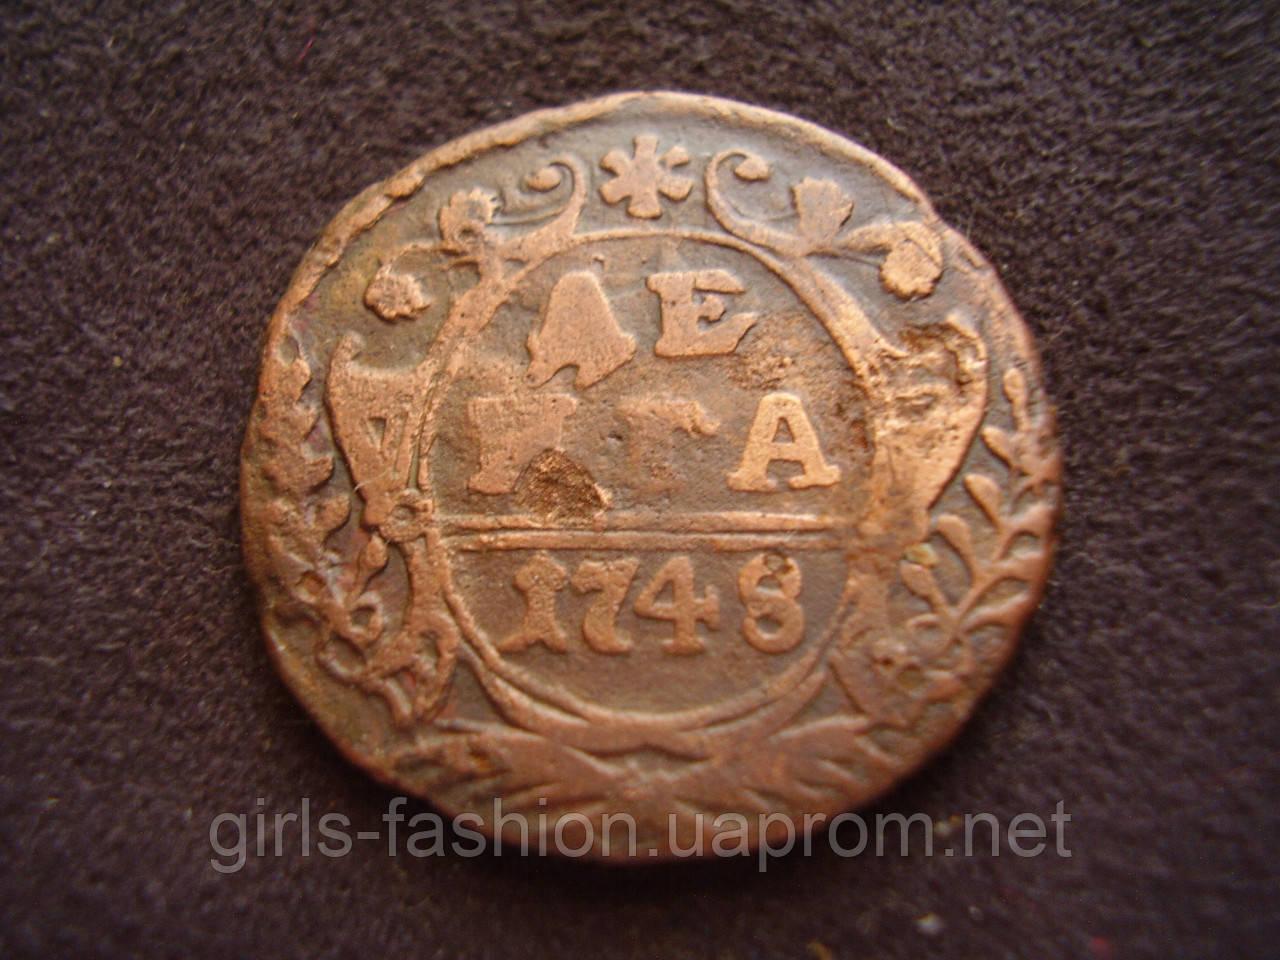 Денга 1748 года цена разновидность лопата мд